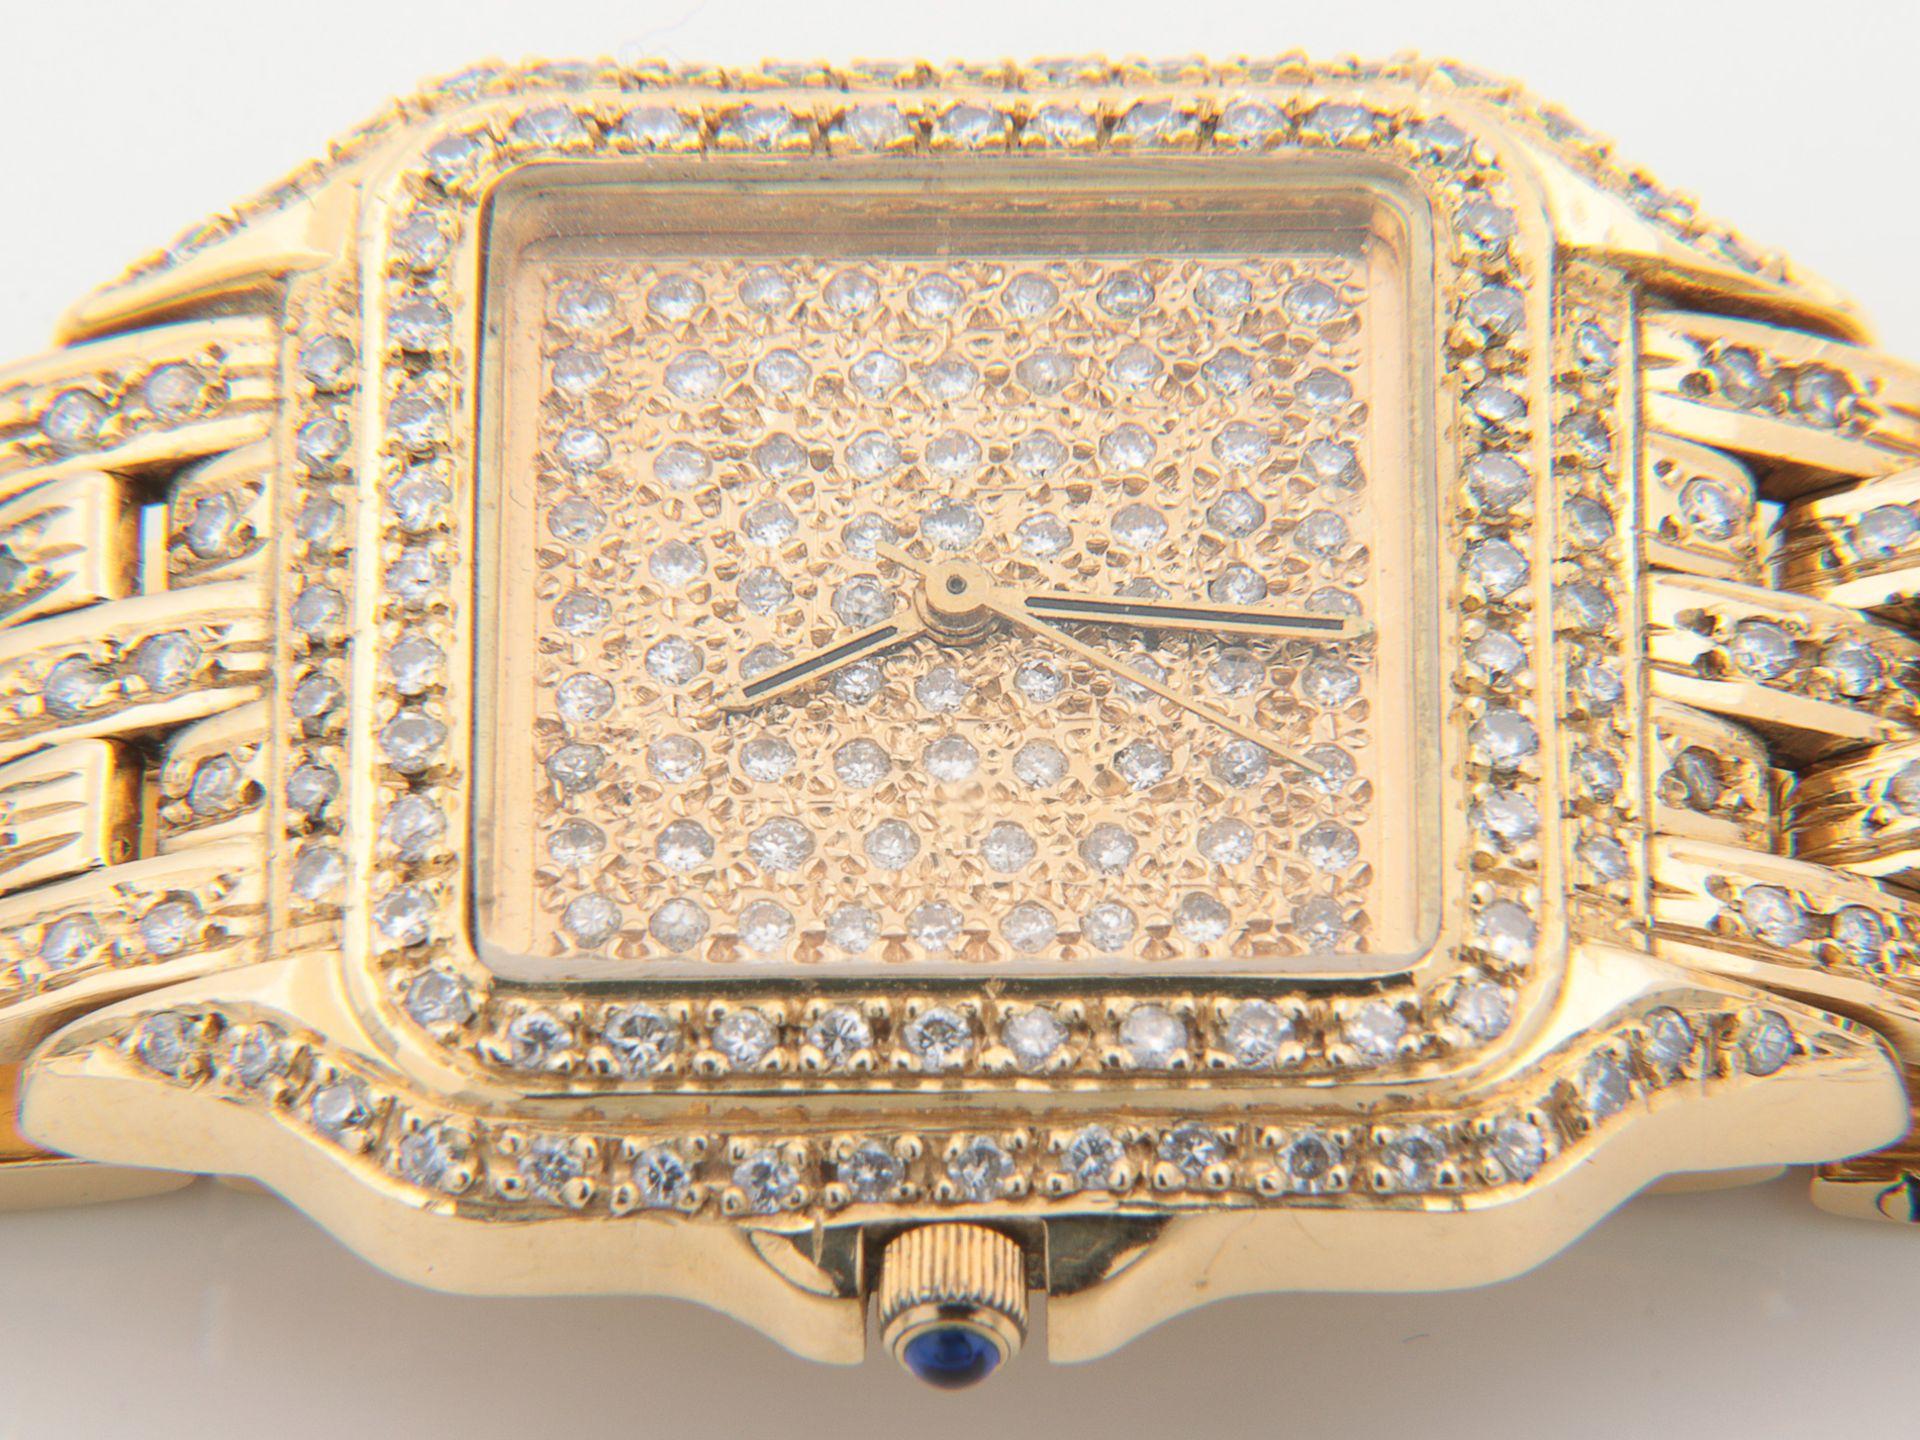 Cartier - Damenarmbanduhr - Image 5 of 14